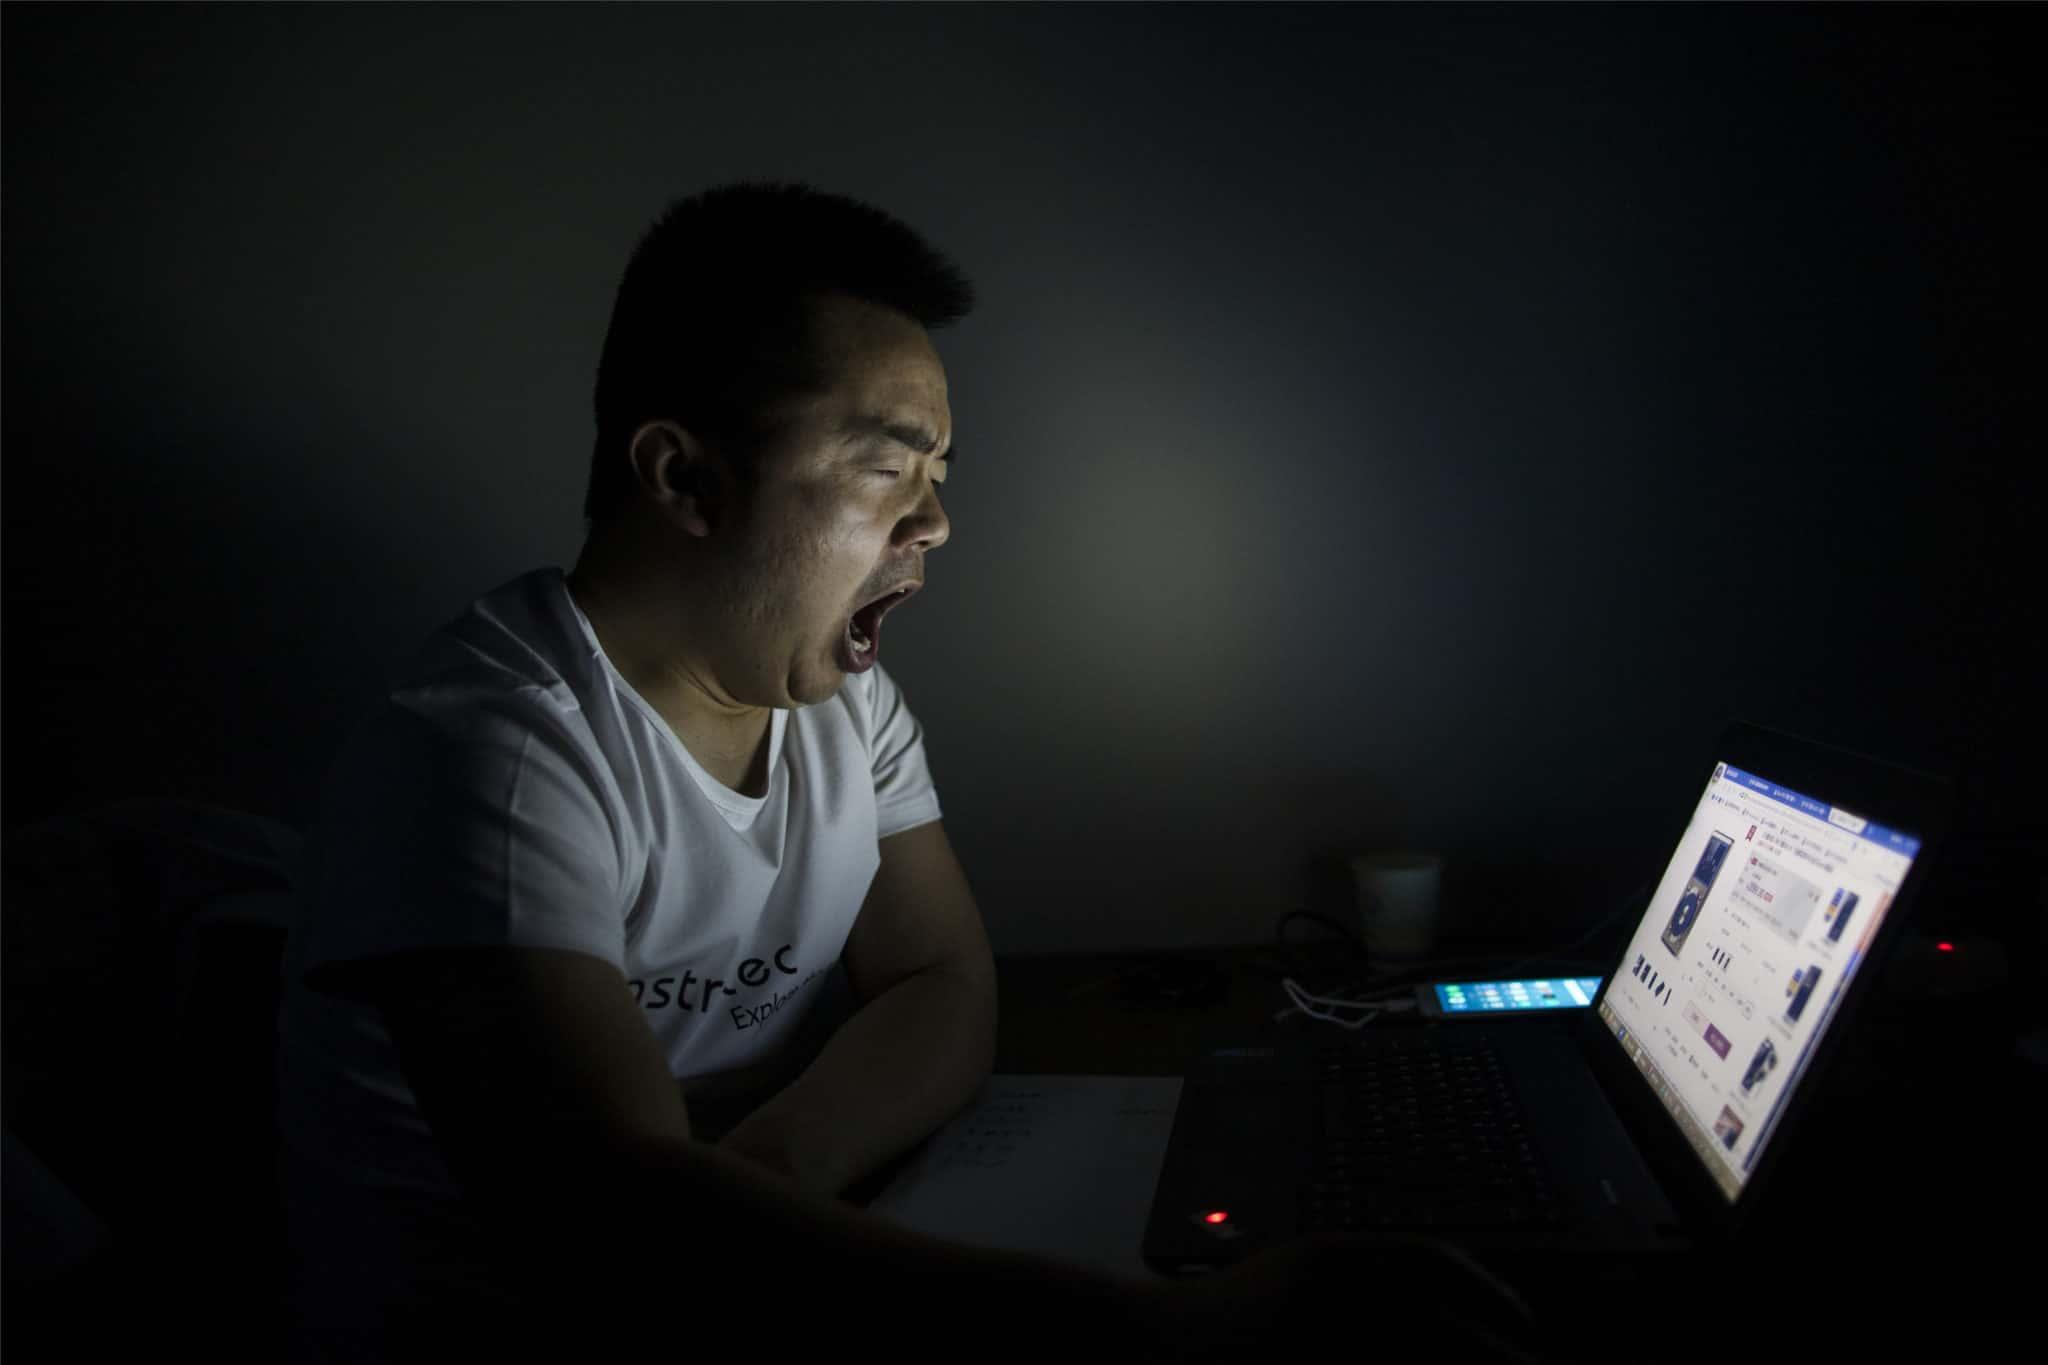 La Cina bandisce i computer esteri: è guerra tecnologica con Trump